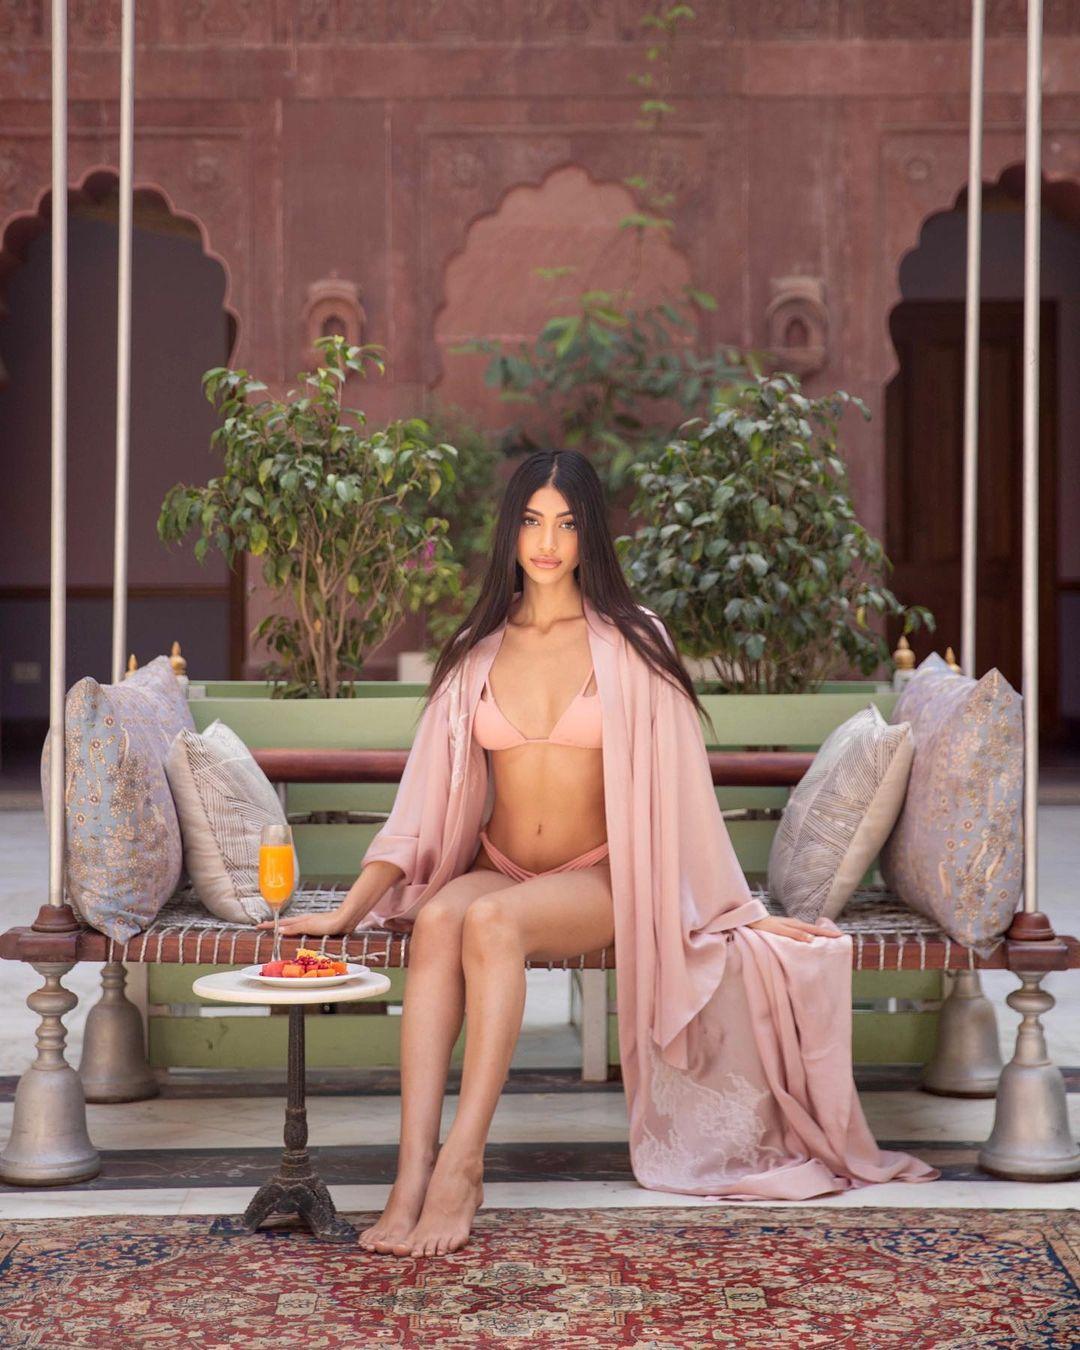 Alanna Panday বিকিনিতে সব সময় নজর কাড়া। (Image: Instagram)